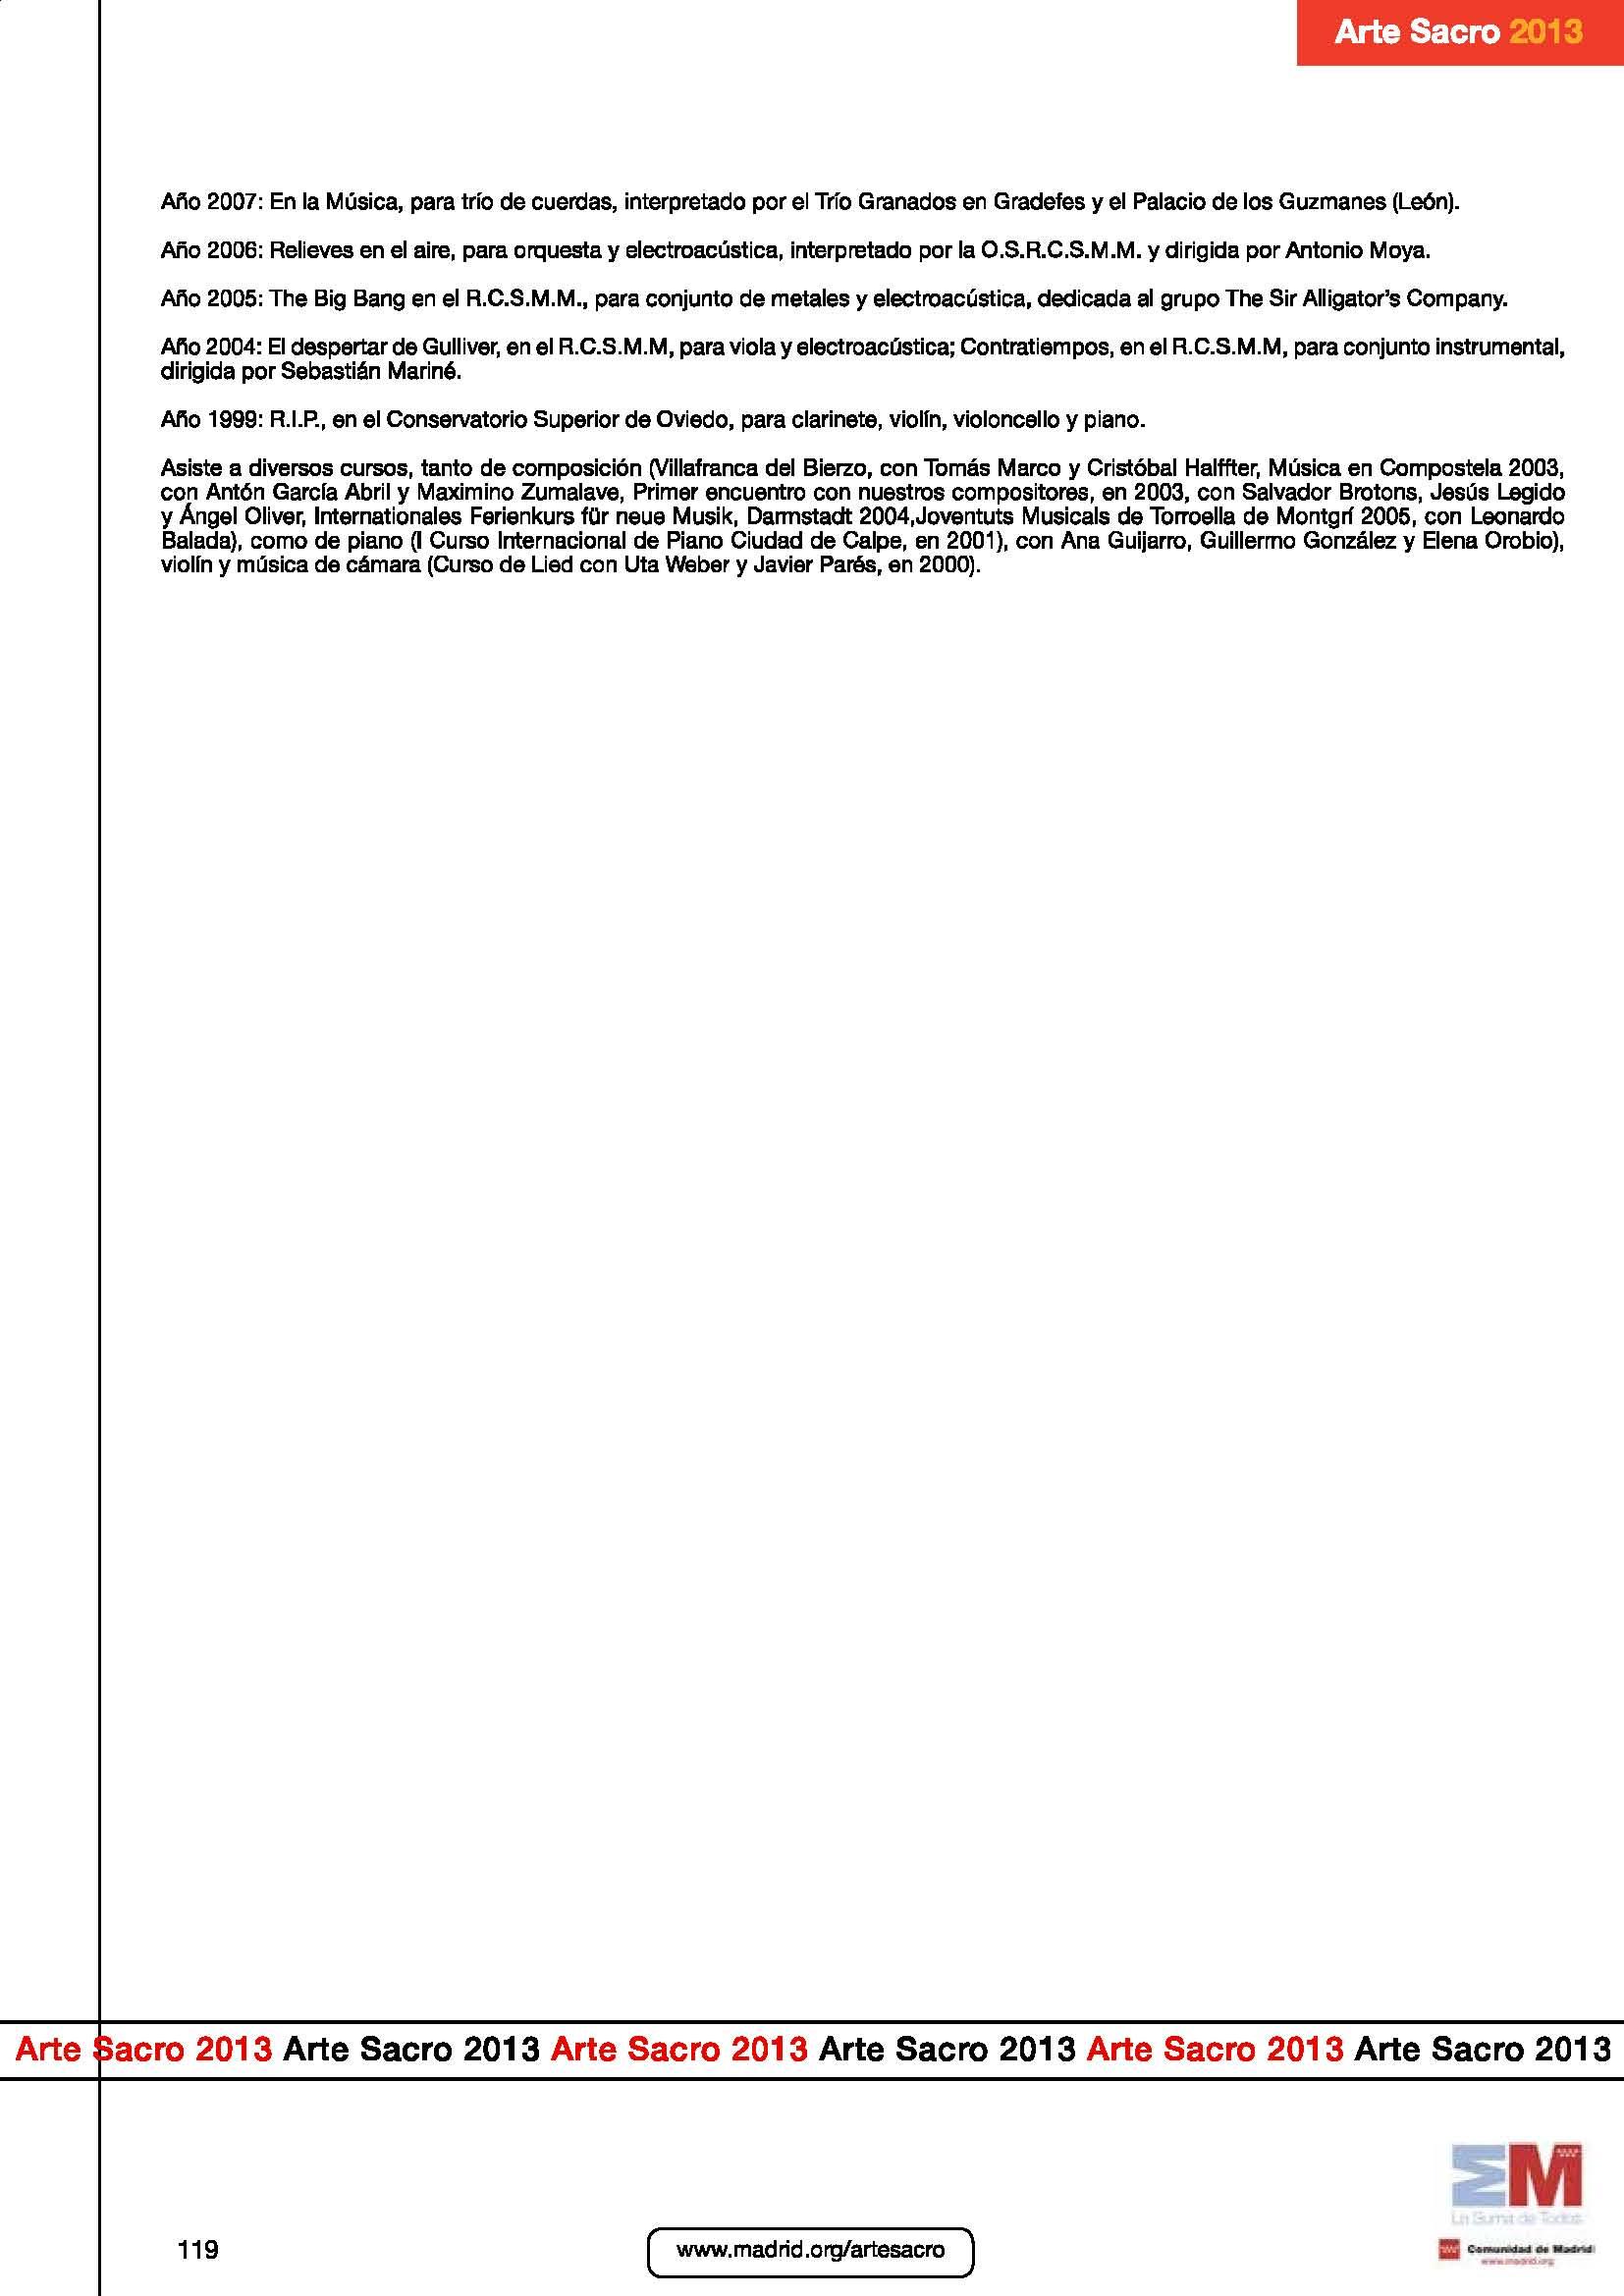 dossier_completo_Página_119